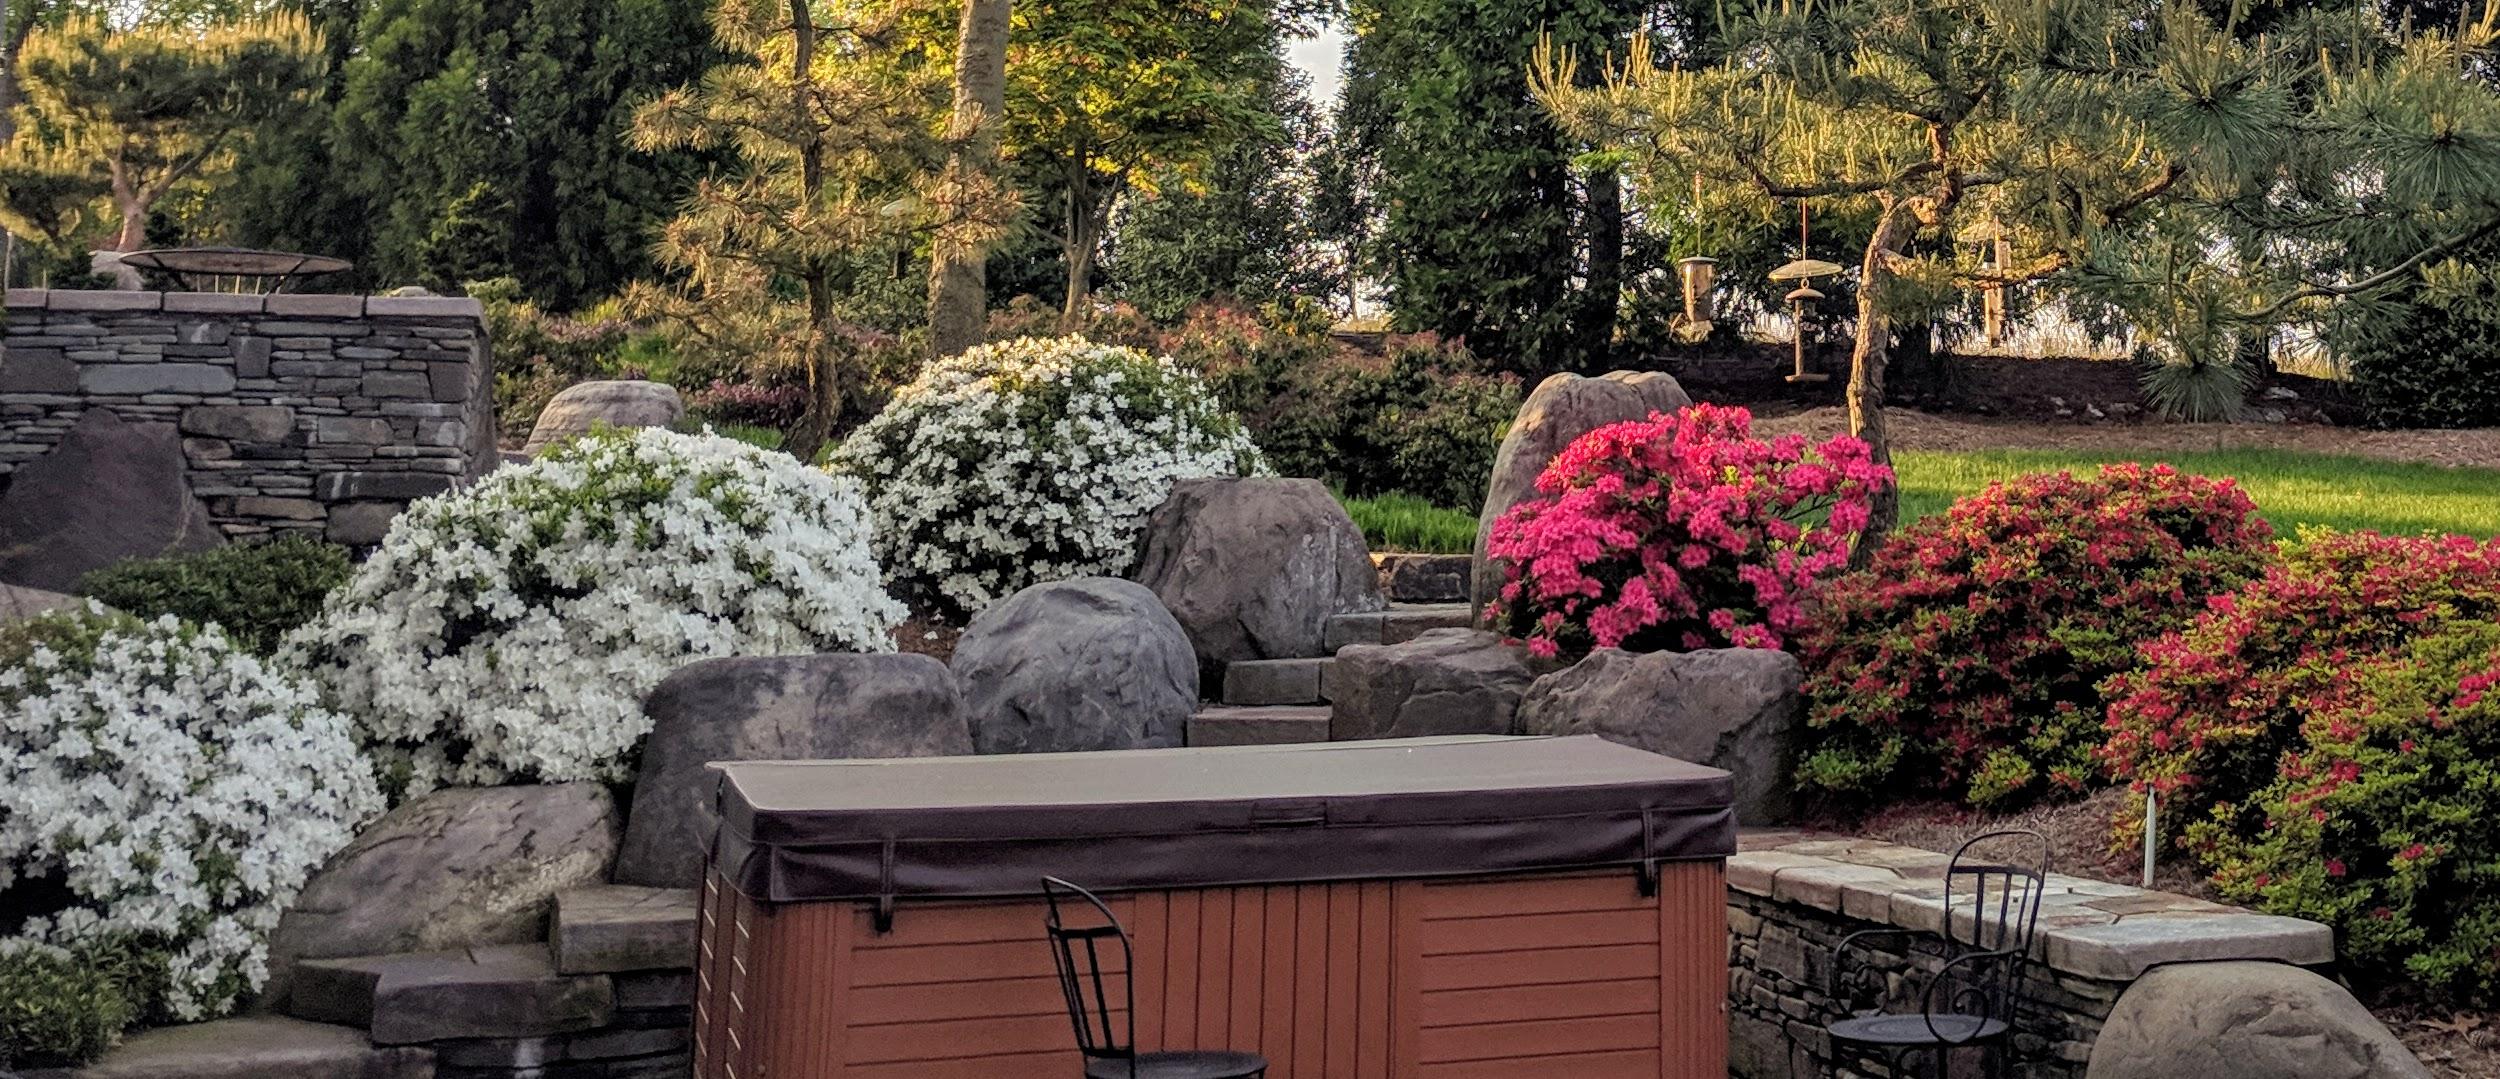 Inspiring garden surrounds hot tub, Manheim, PA